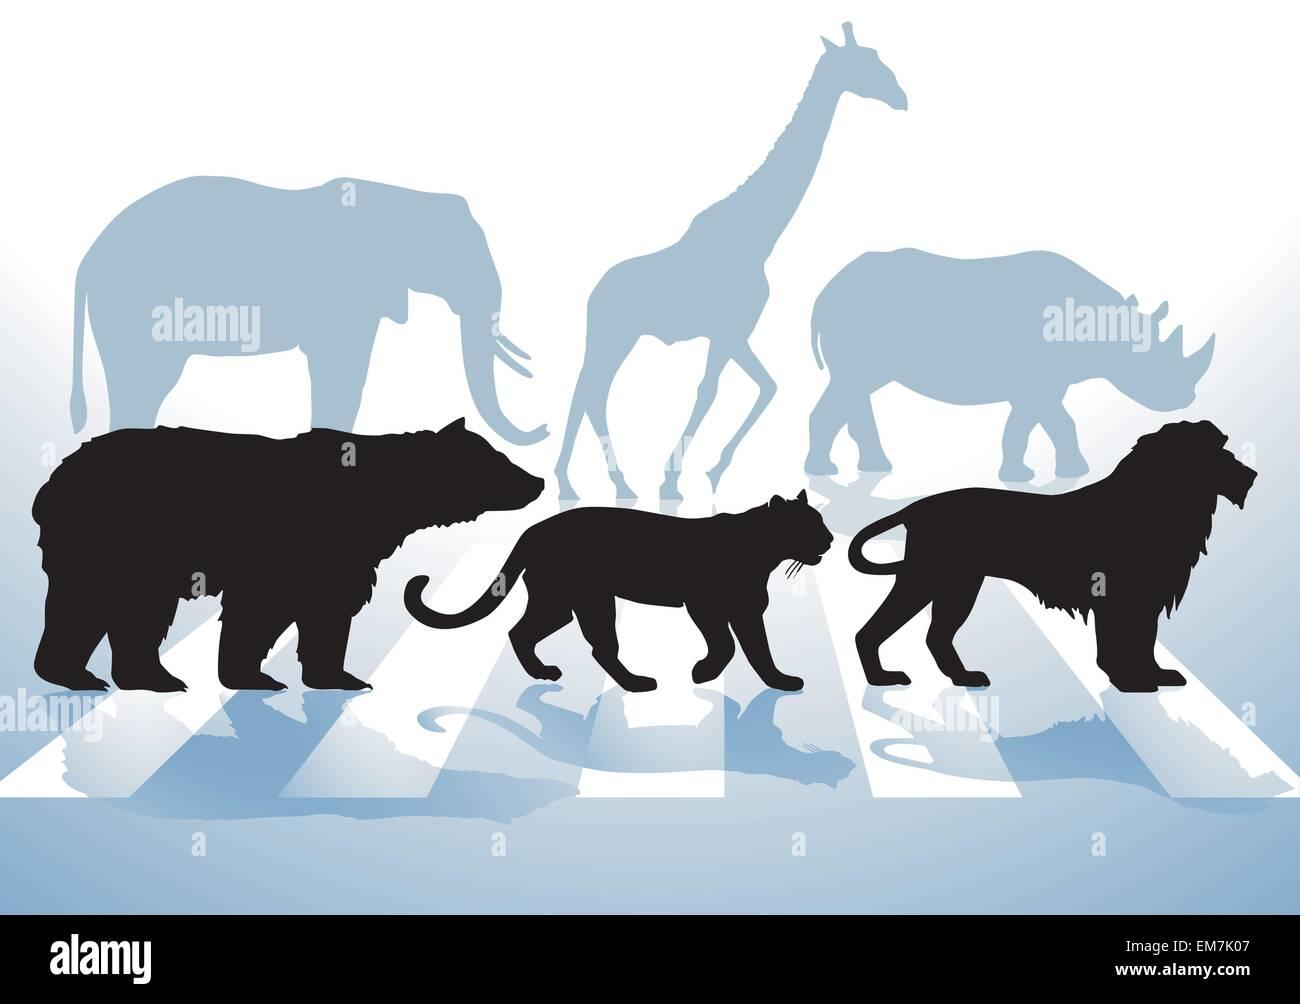 Animal Protection - Stock Vector